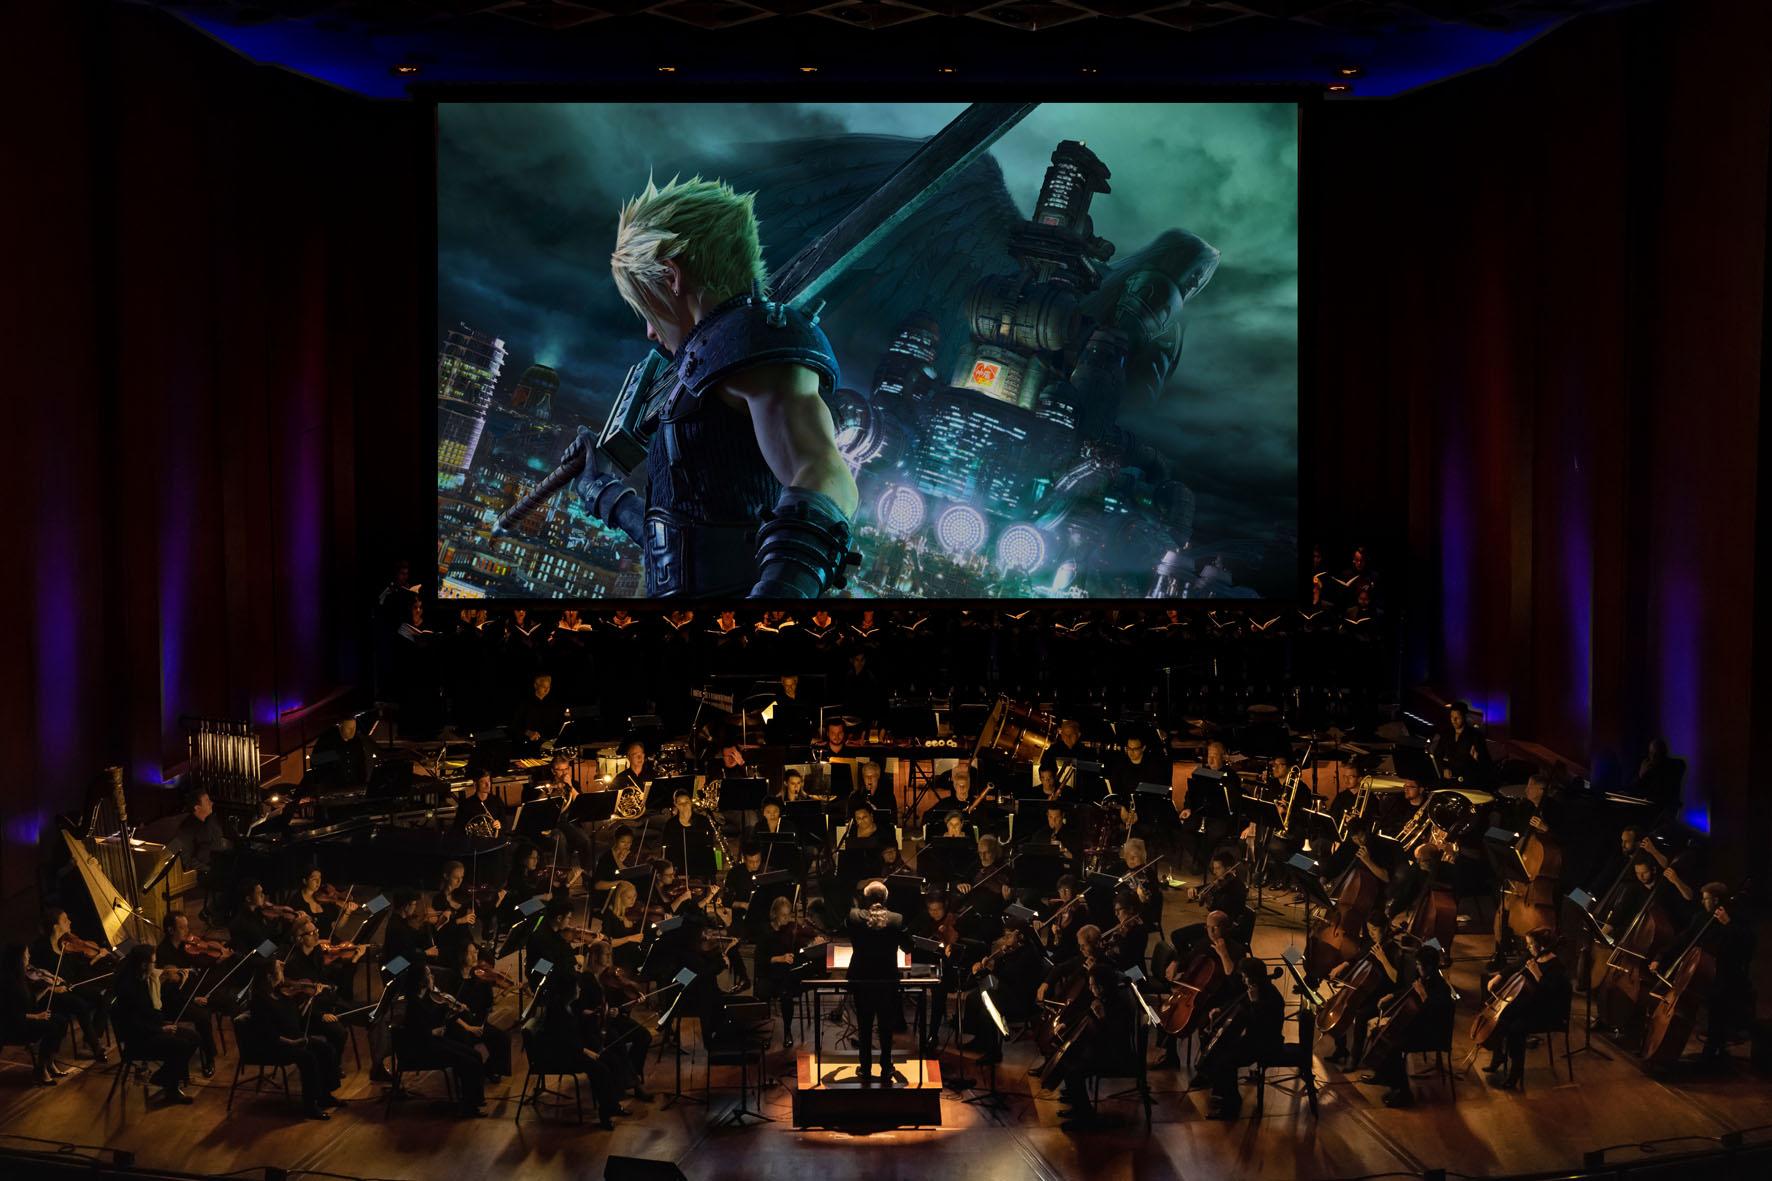 Teatro Arcimboldi - FINAL FANTASY VII REMAKE Orchestra World Tour - apertura vendite